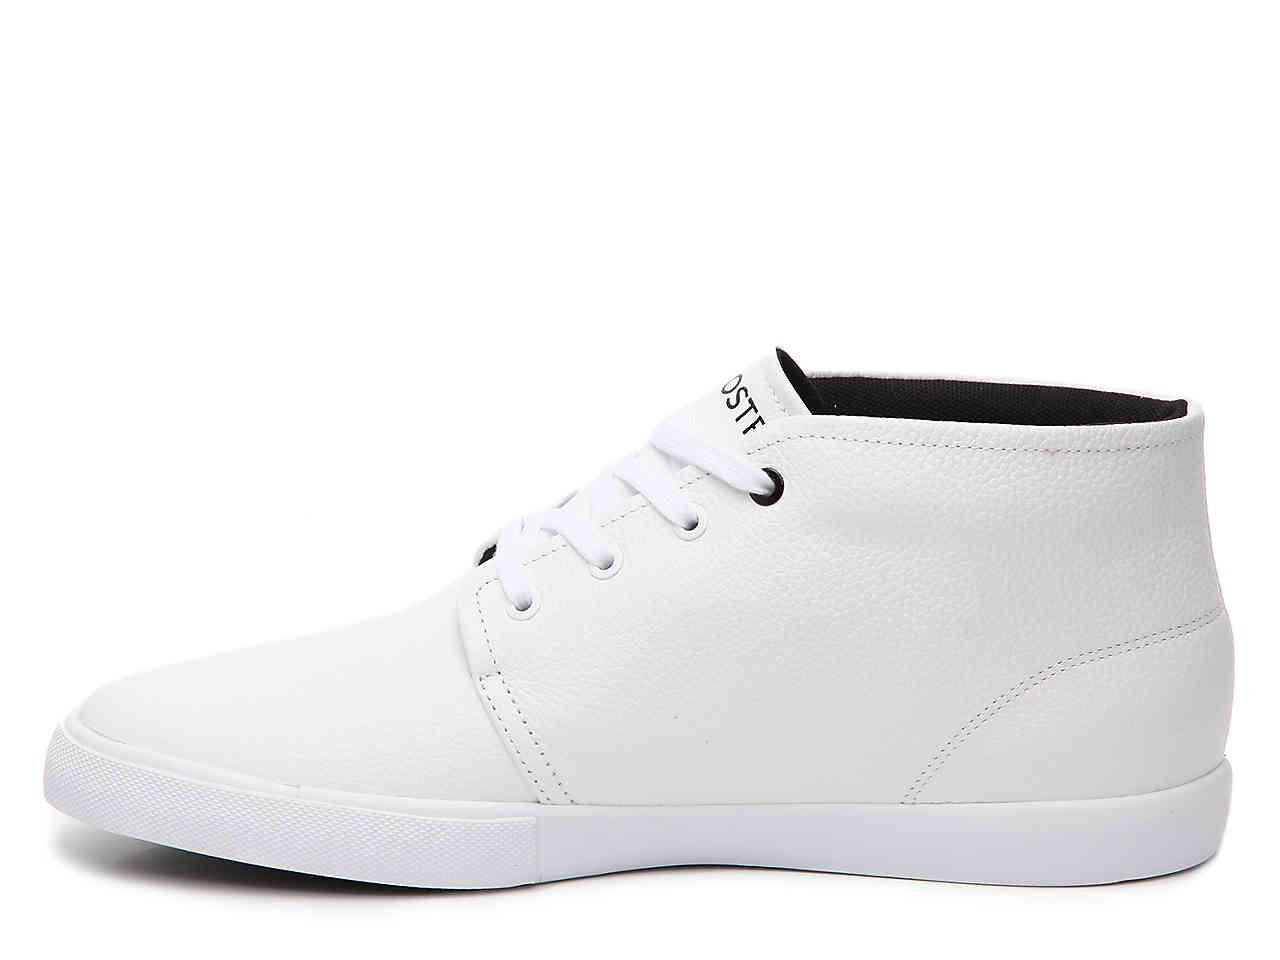 66f8d7feeb90c Lyst - Lacoste Asparta Mid-top Sneaker in White for Men